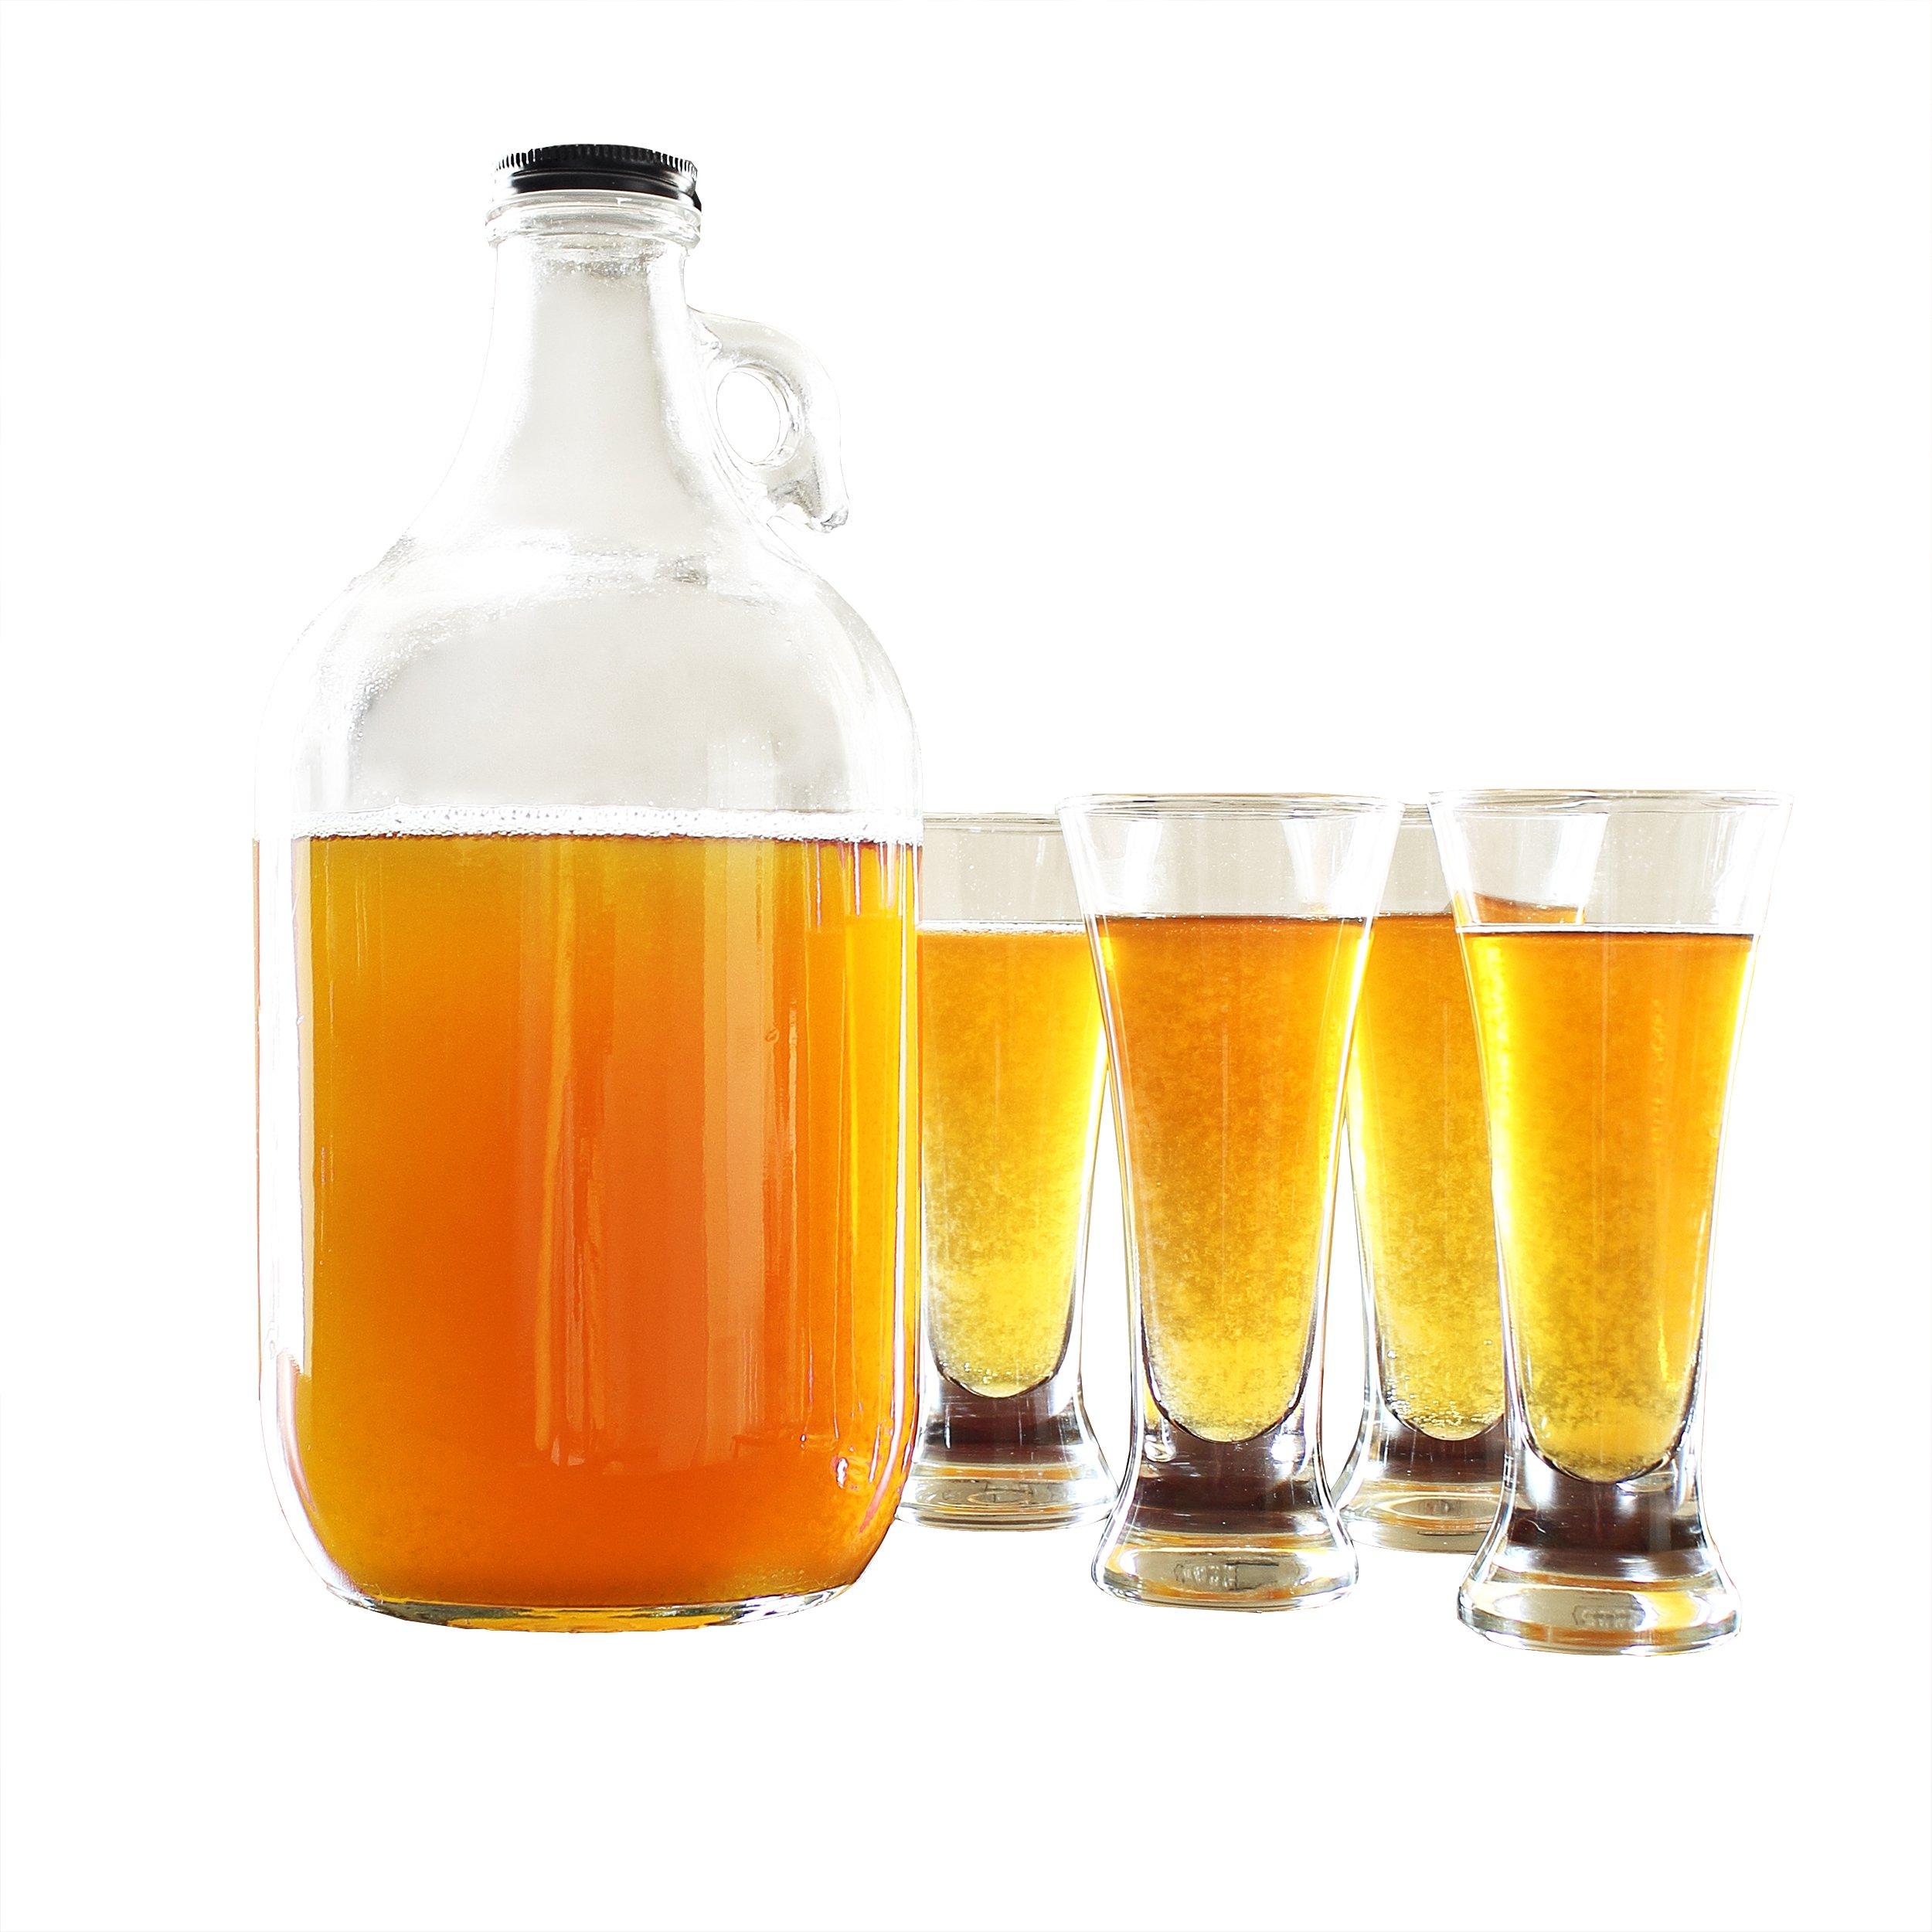 Cathy's Concepts Craft Beer Growler & Tasters Set